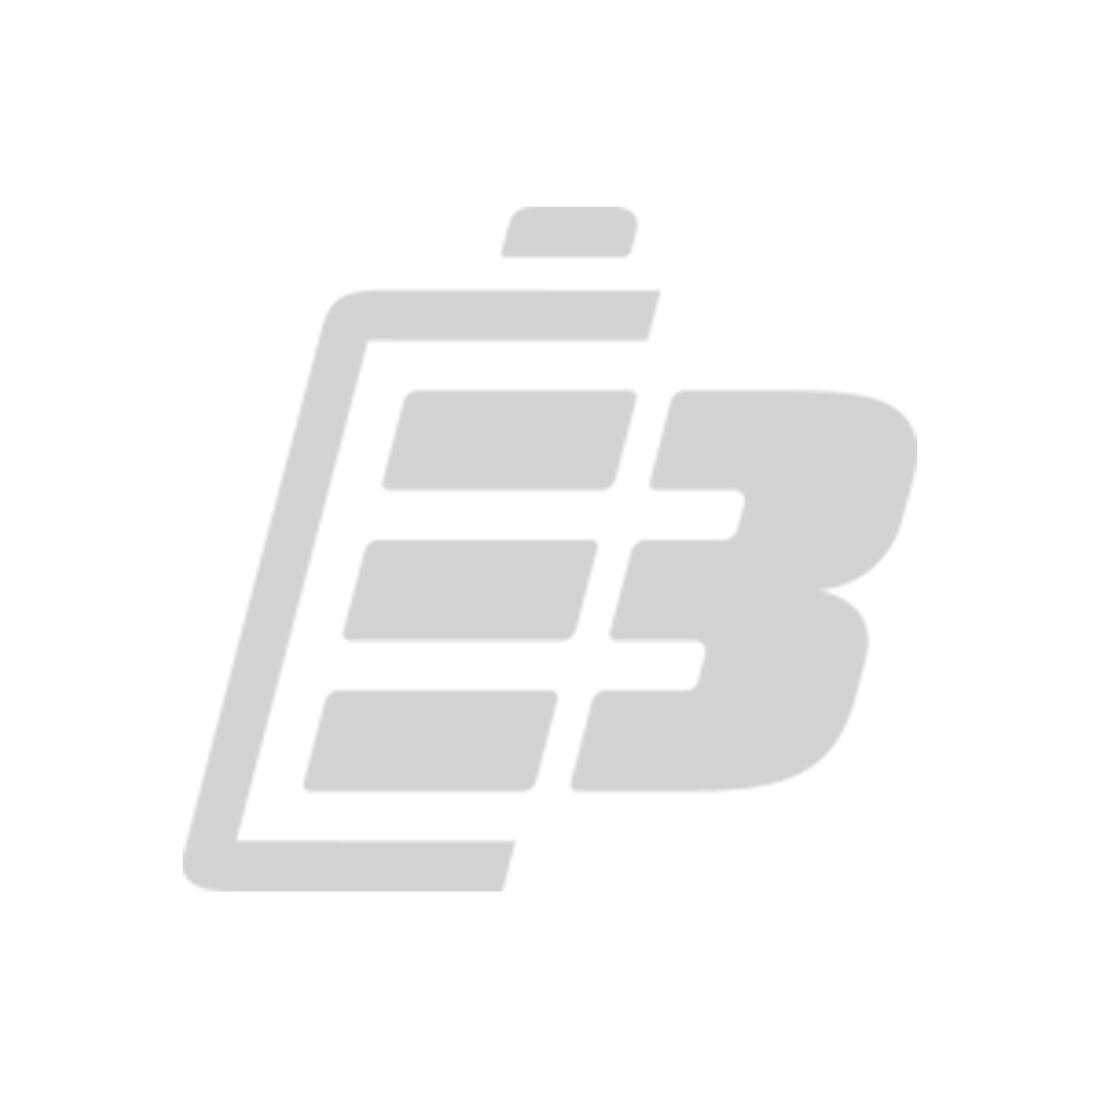 Eneloop Pro AAA PreCharged Battery 930mah 1